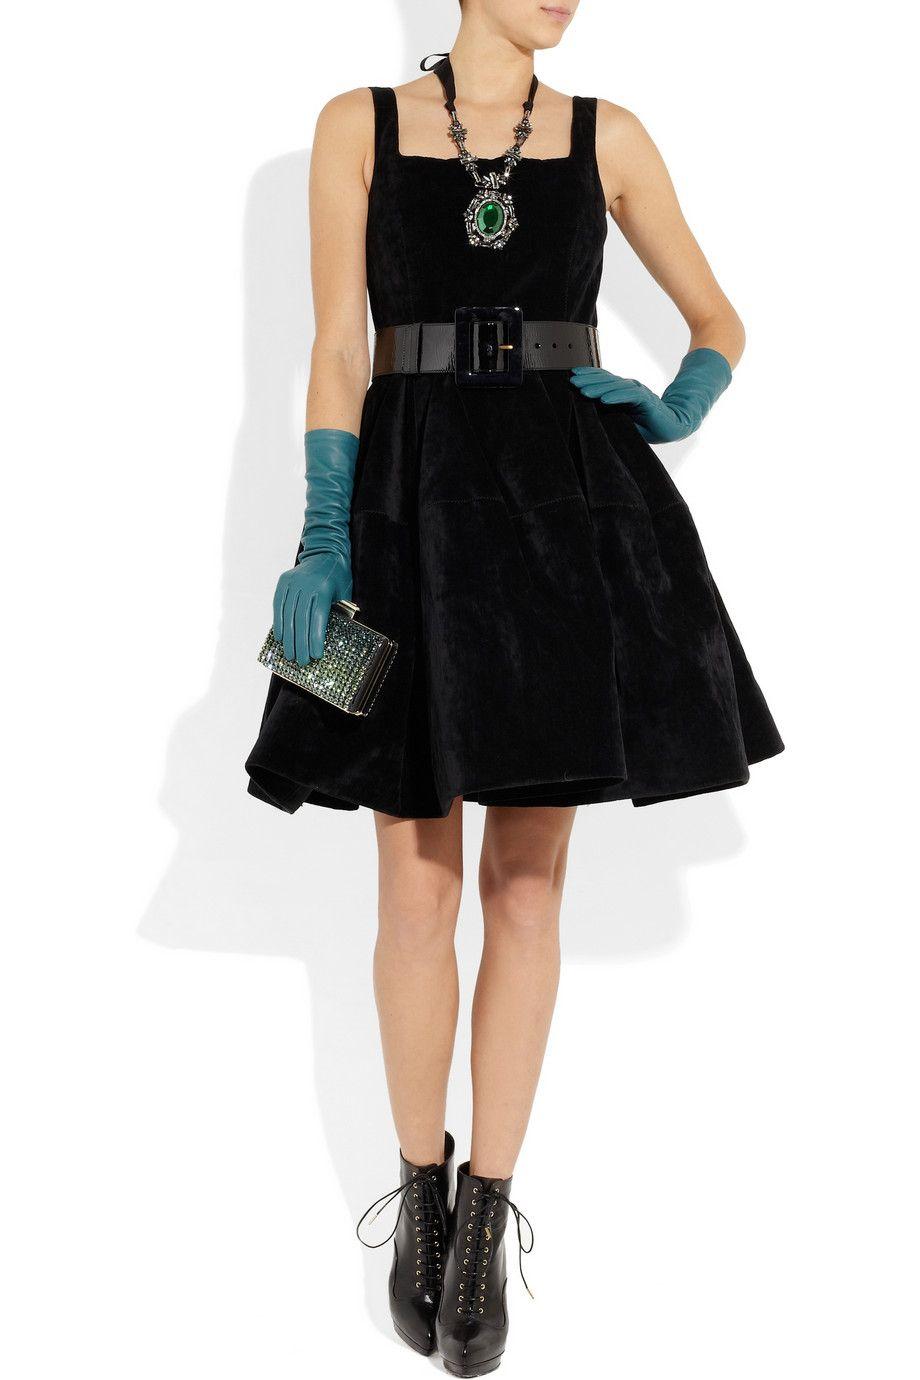 Sky Blue Long Leather Gloves Lanvin Black Velvet Dress Dress Gloves Fashion [ 1380 x 920 Pixel ]